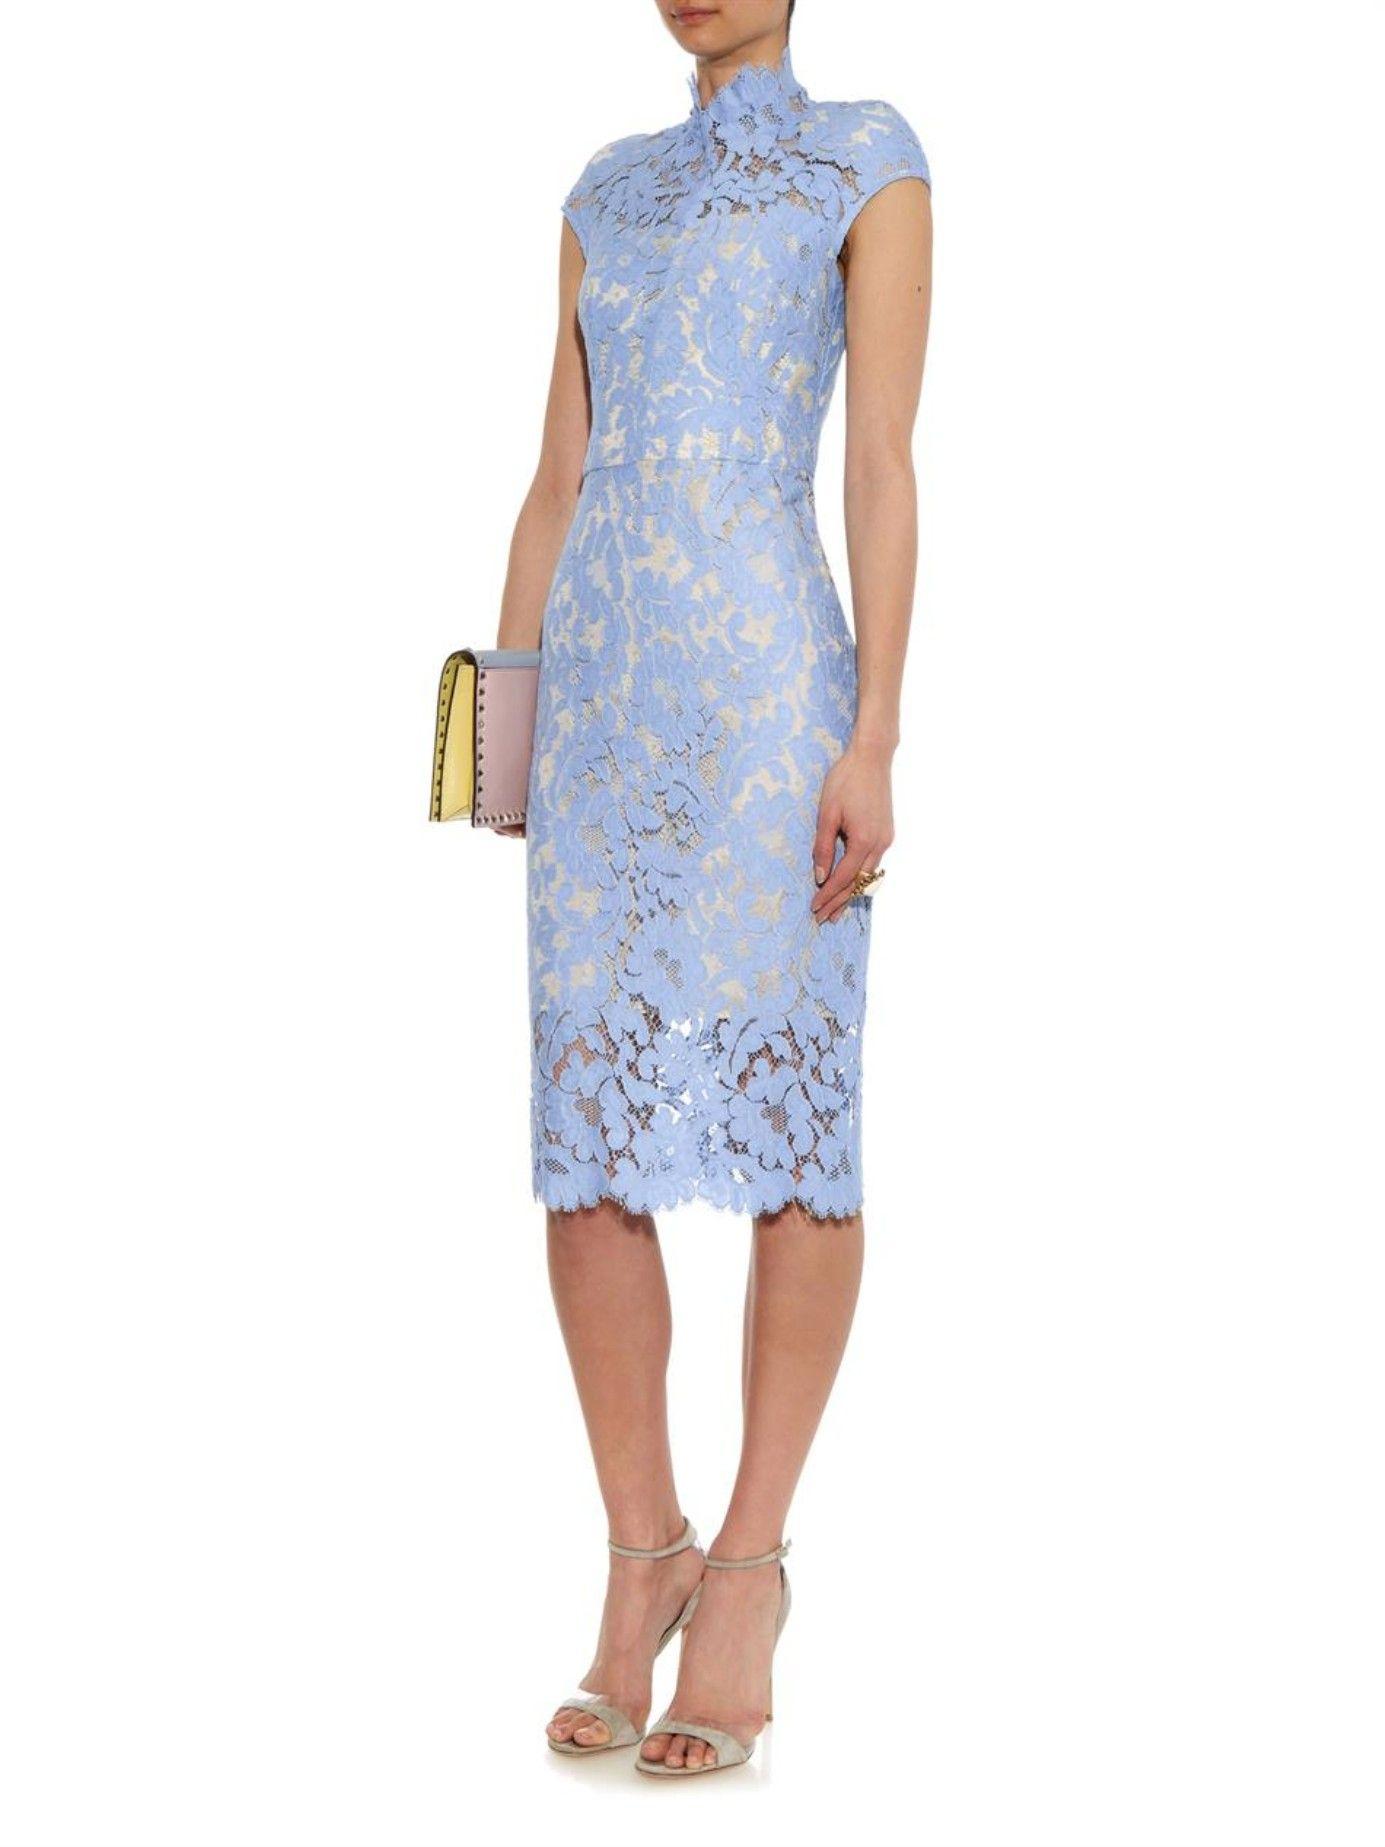 Light blue lace midi dress